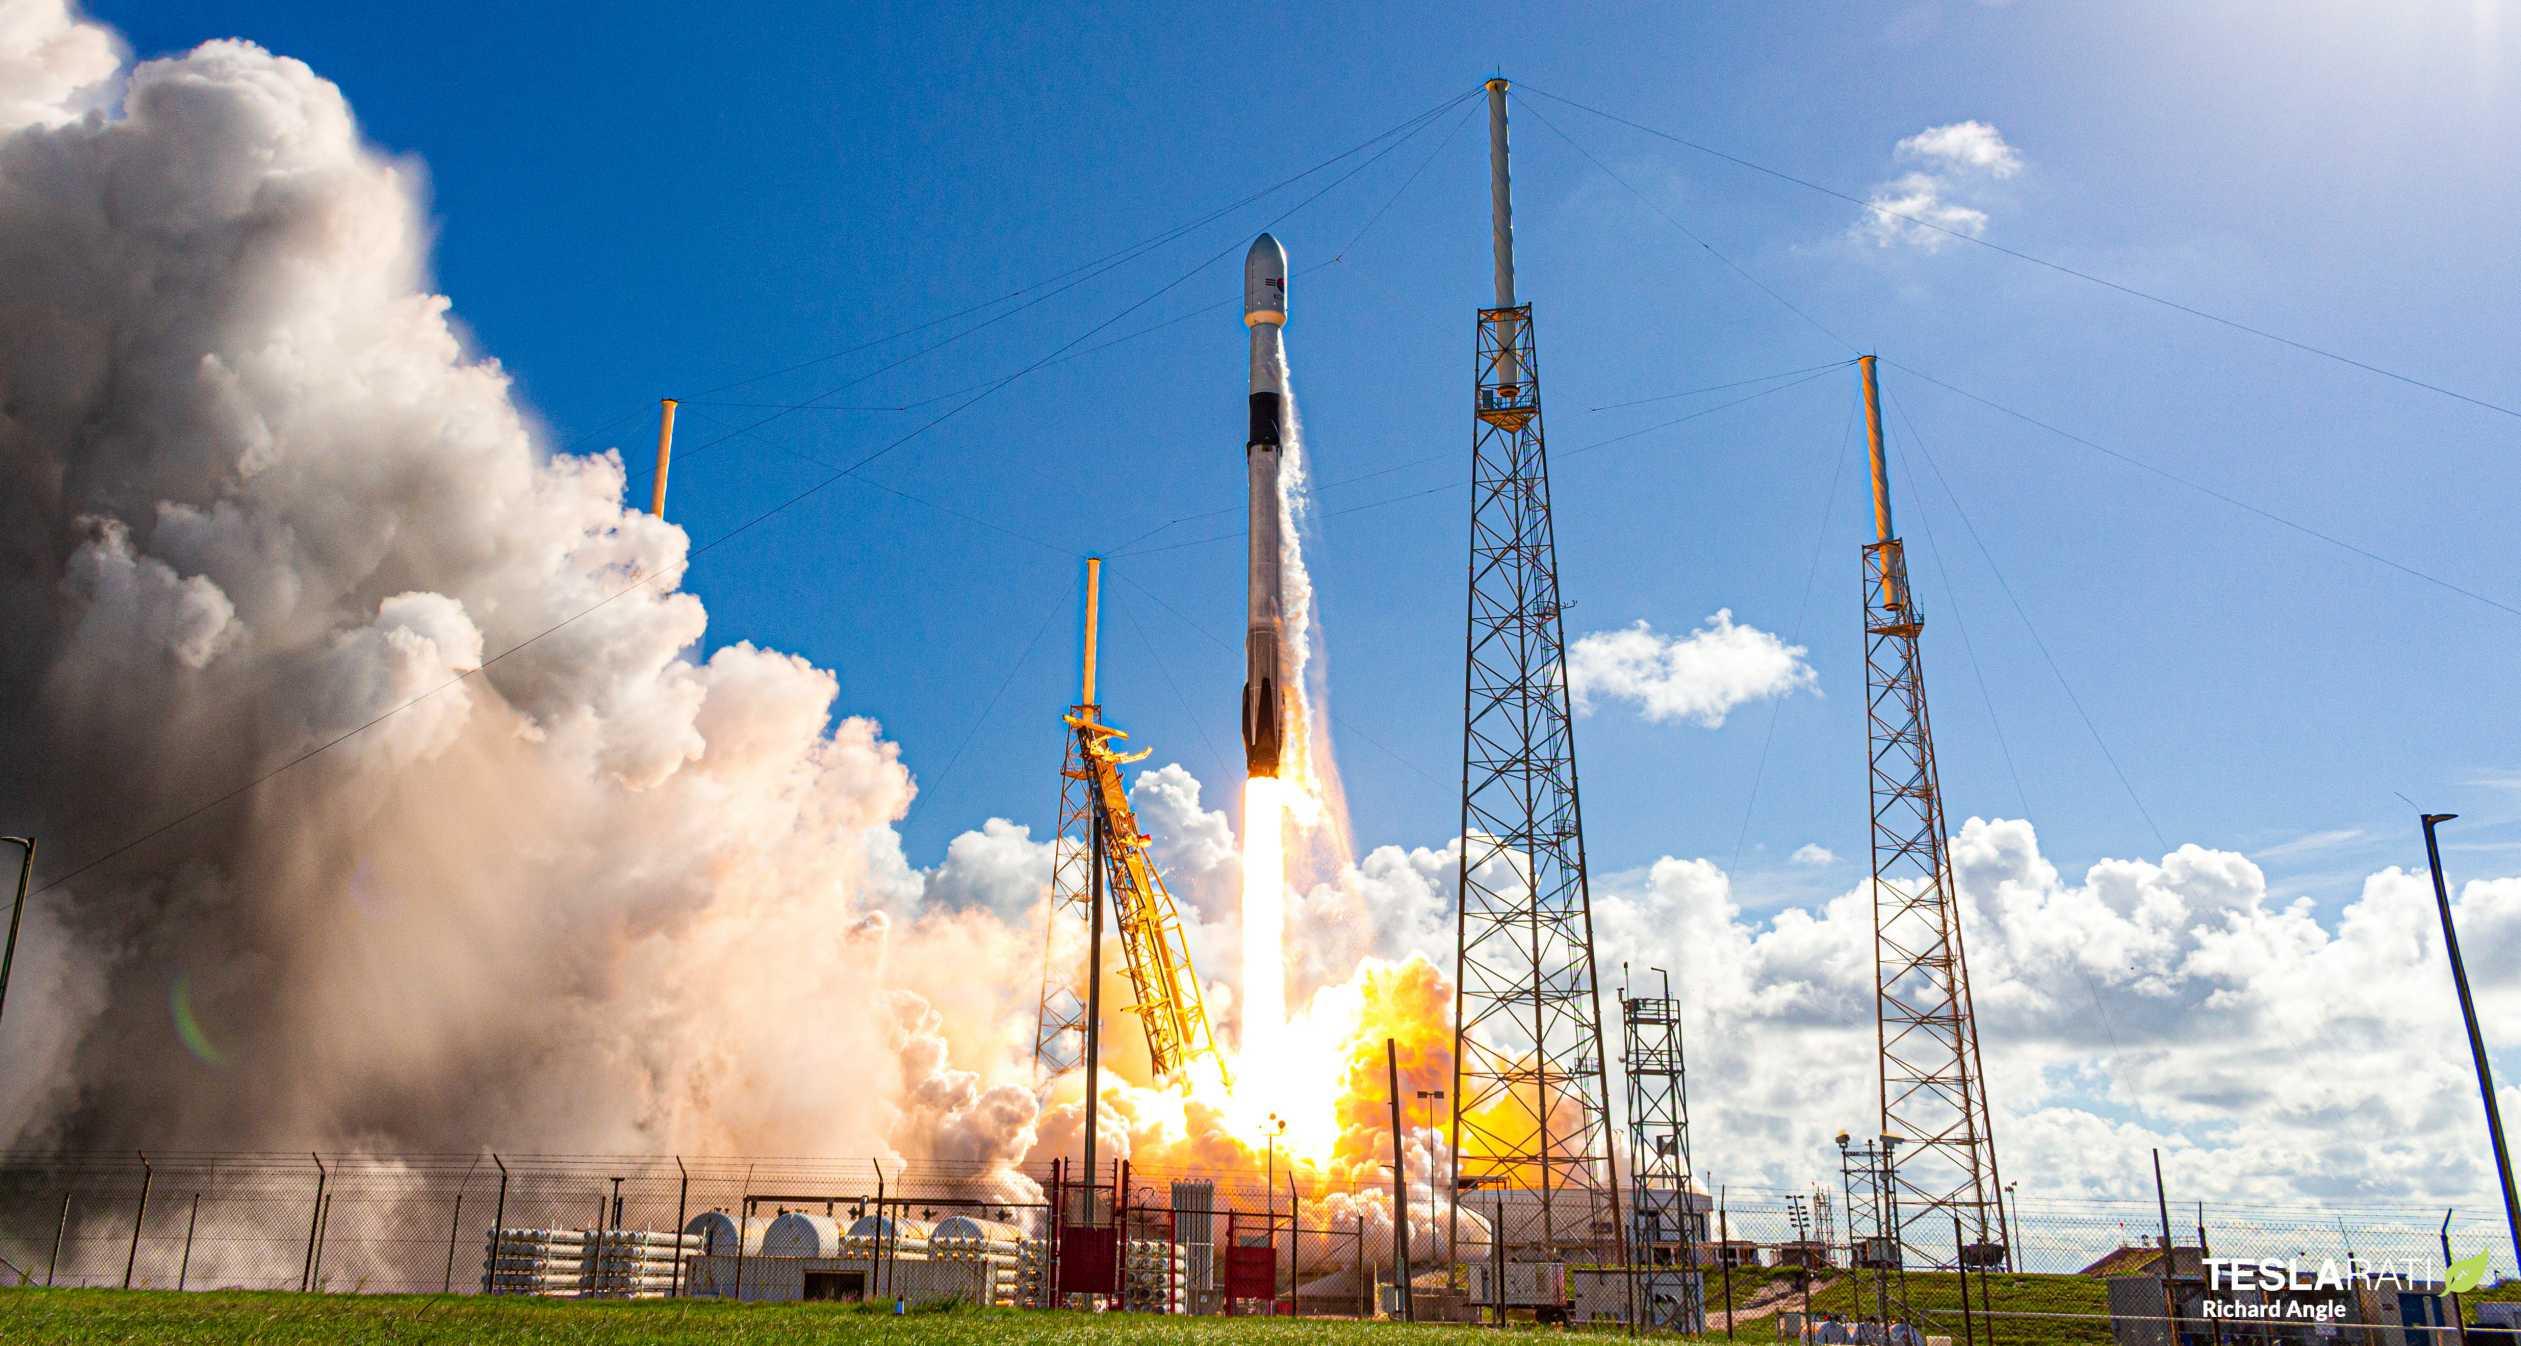 ANASIS II Falcon 9 B1058 072020 (Richard Angle) launch 3 crop (c)